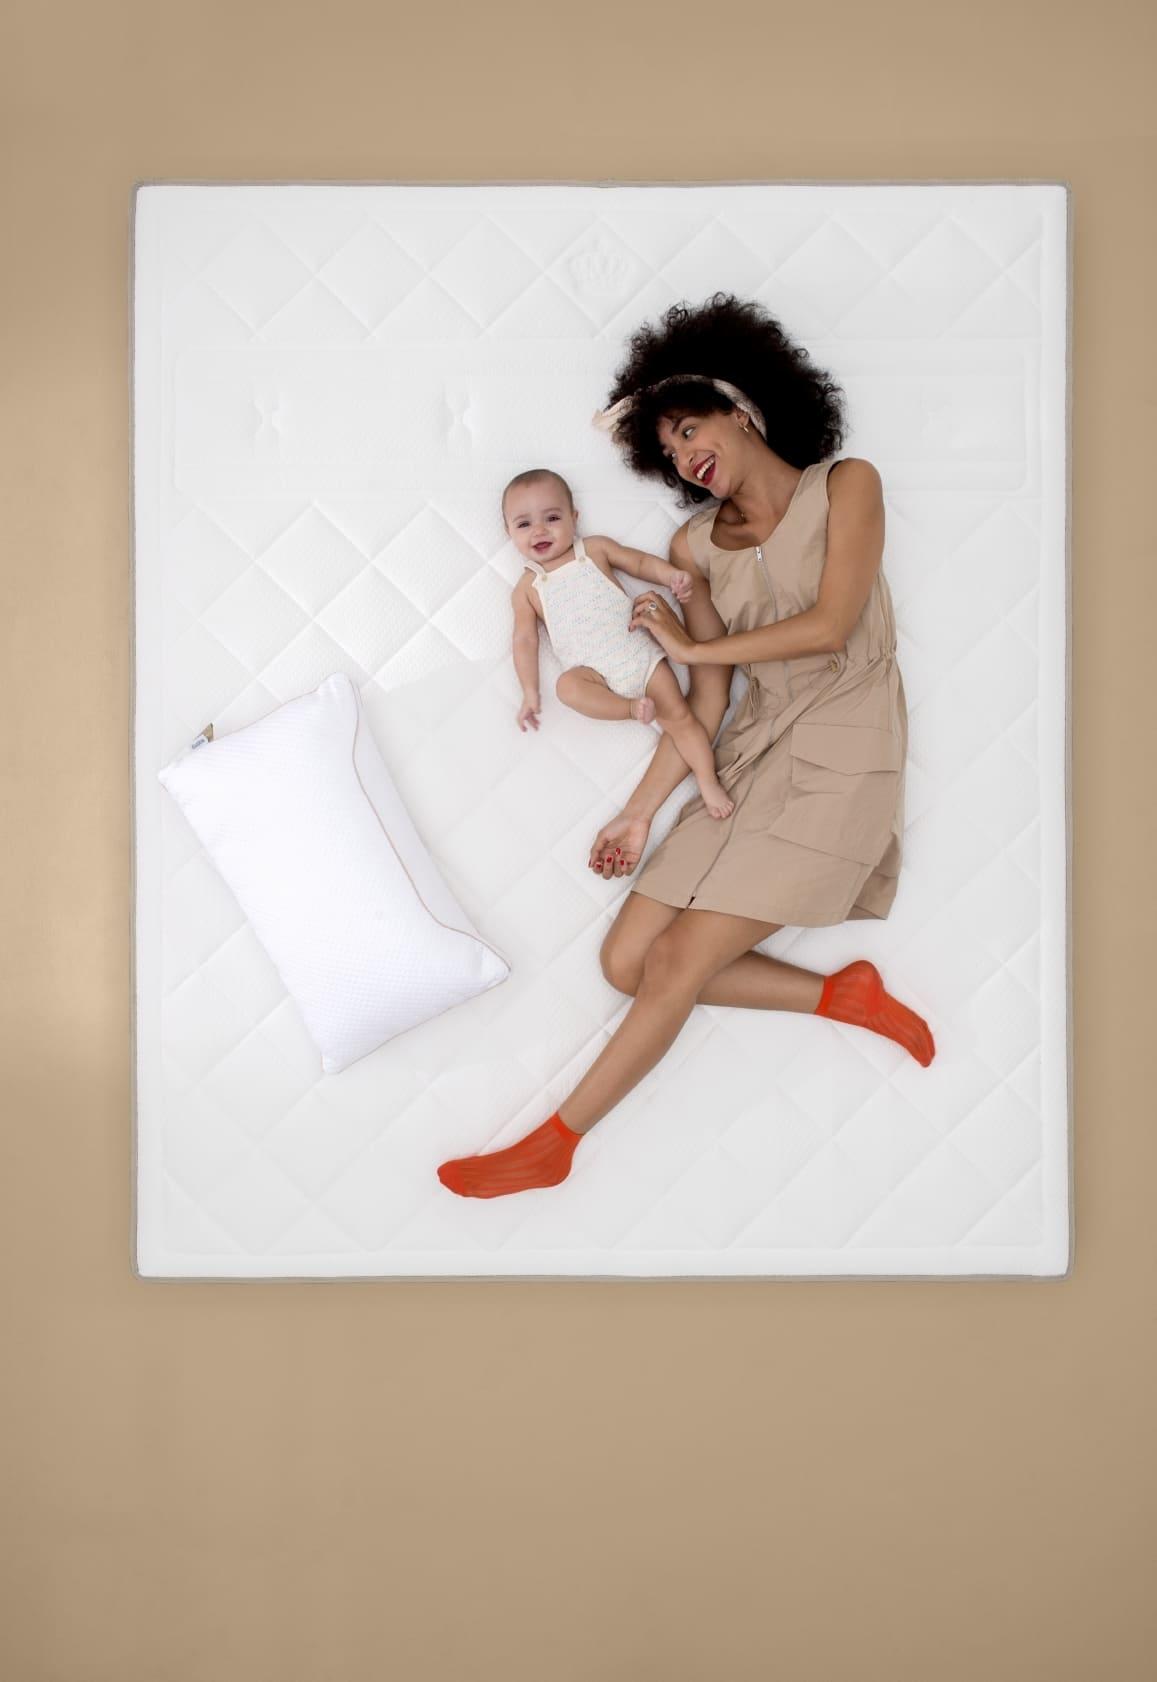 5 schlaftipps f r junge eltern die betten berater. Black Bedroom Furniture Sets. Home Design Ideas